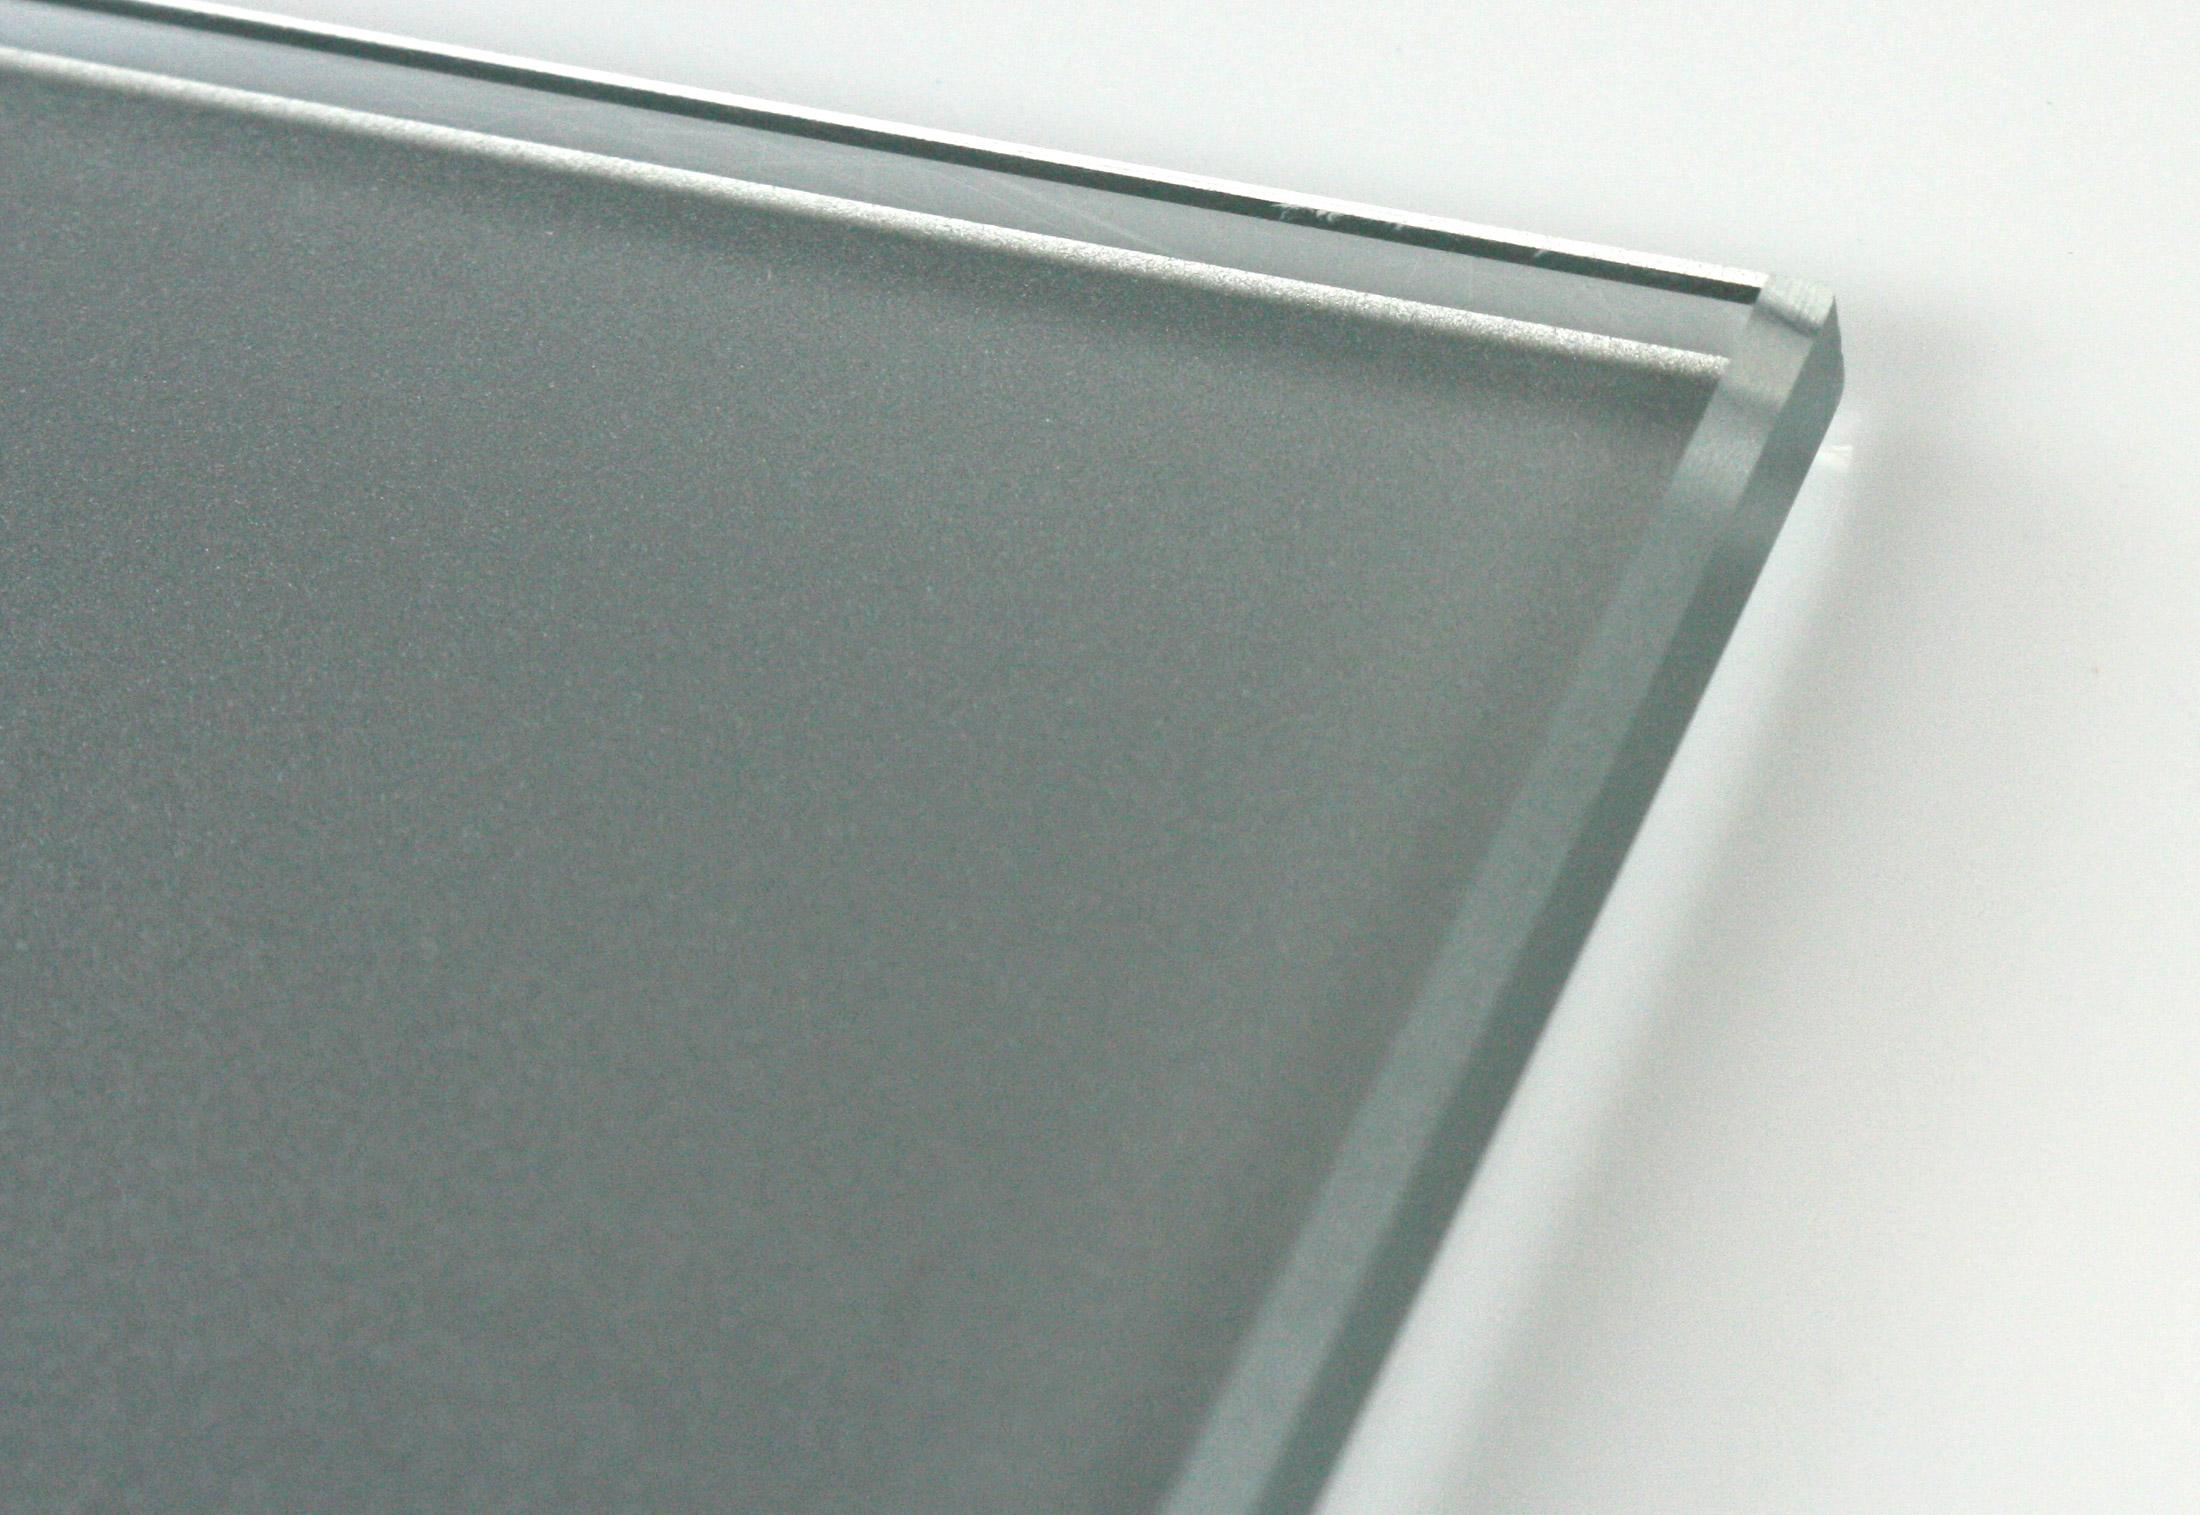 eurofloat deco brush white aluminium coloured by glas. Black Bedroom Furniture Sets. Home Design Ideas